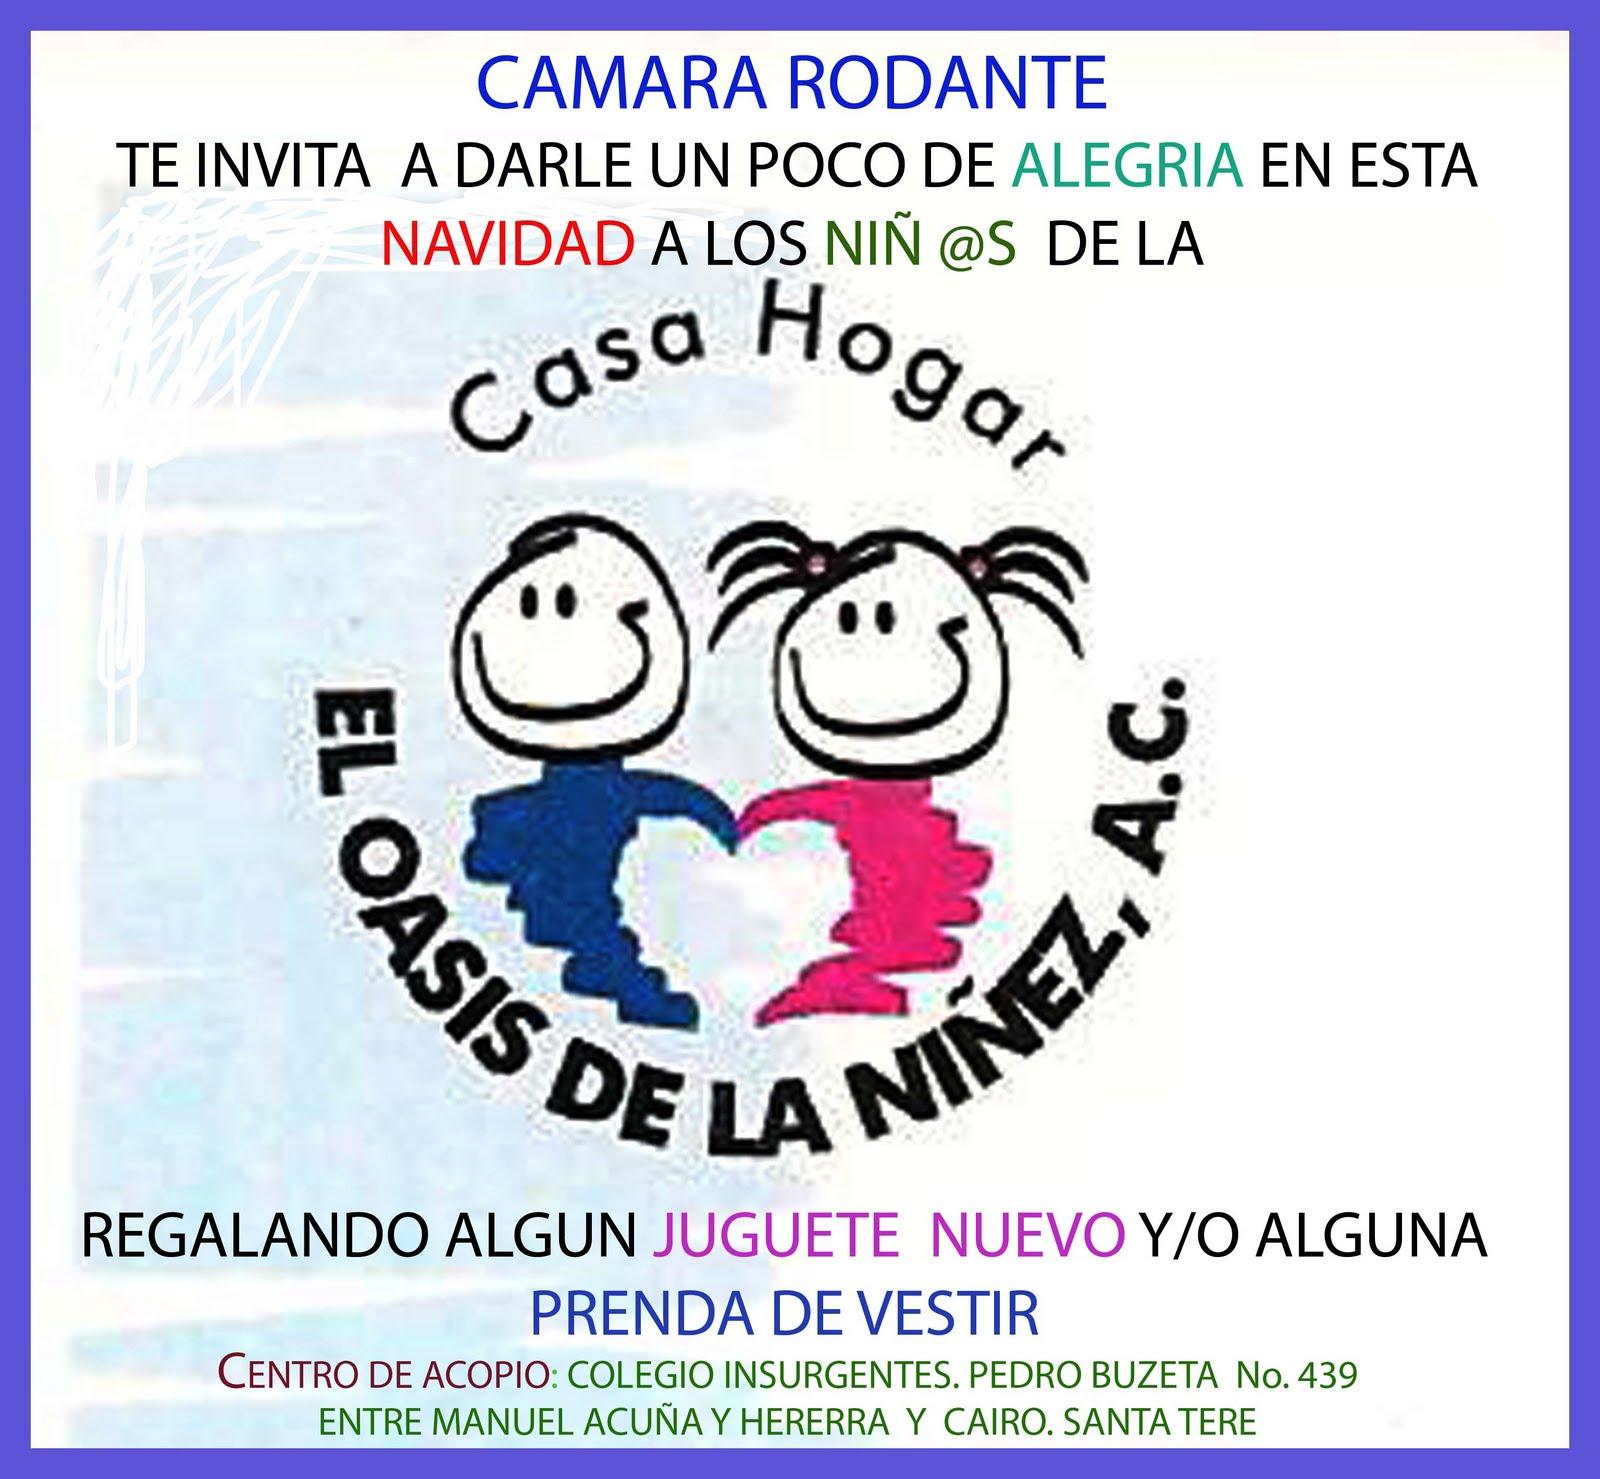 CÁMARA RODANTE: A RODAR ESTE DOMINGO HACIA LA CASA HOGAR \